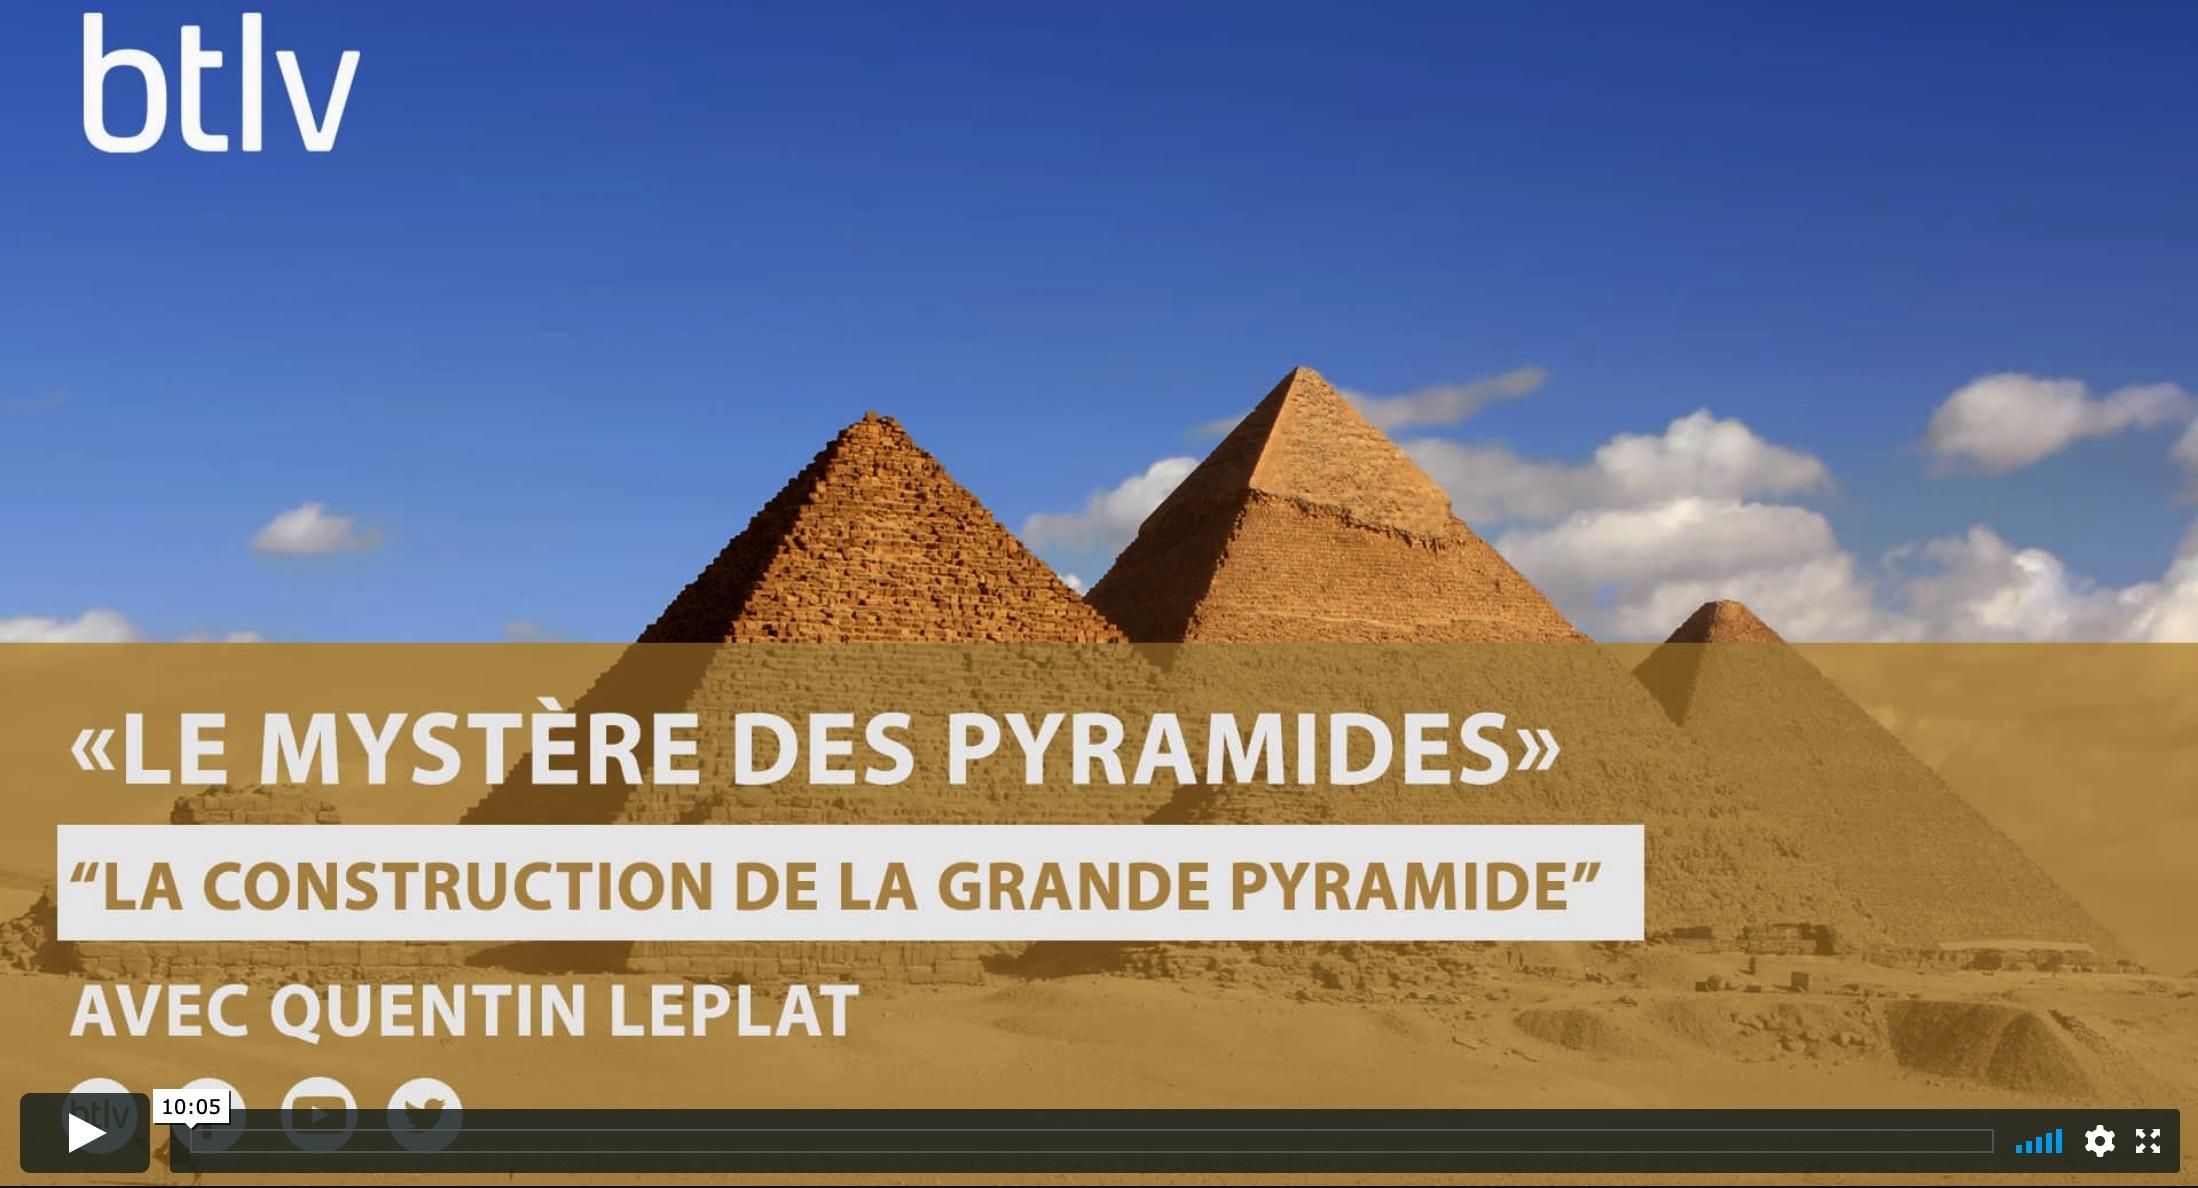 quentin-leplat-le-mystere-des-pyramides_scruberthumbnail_1